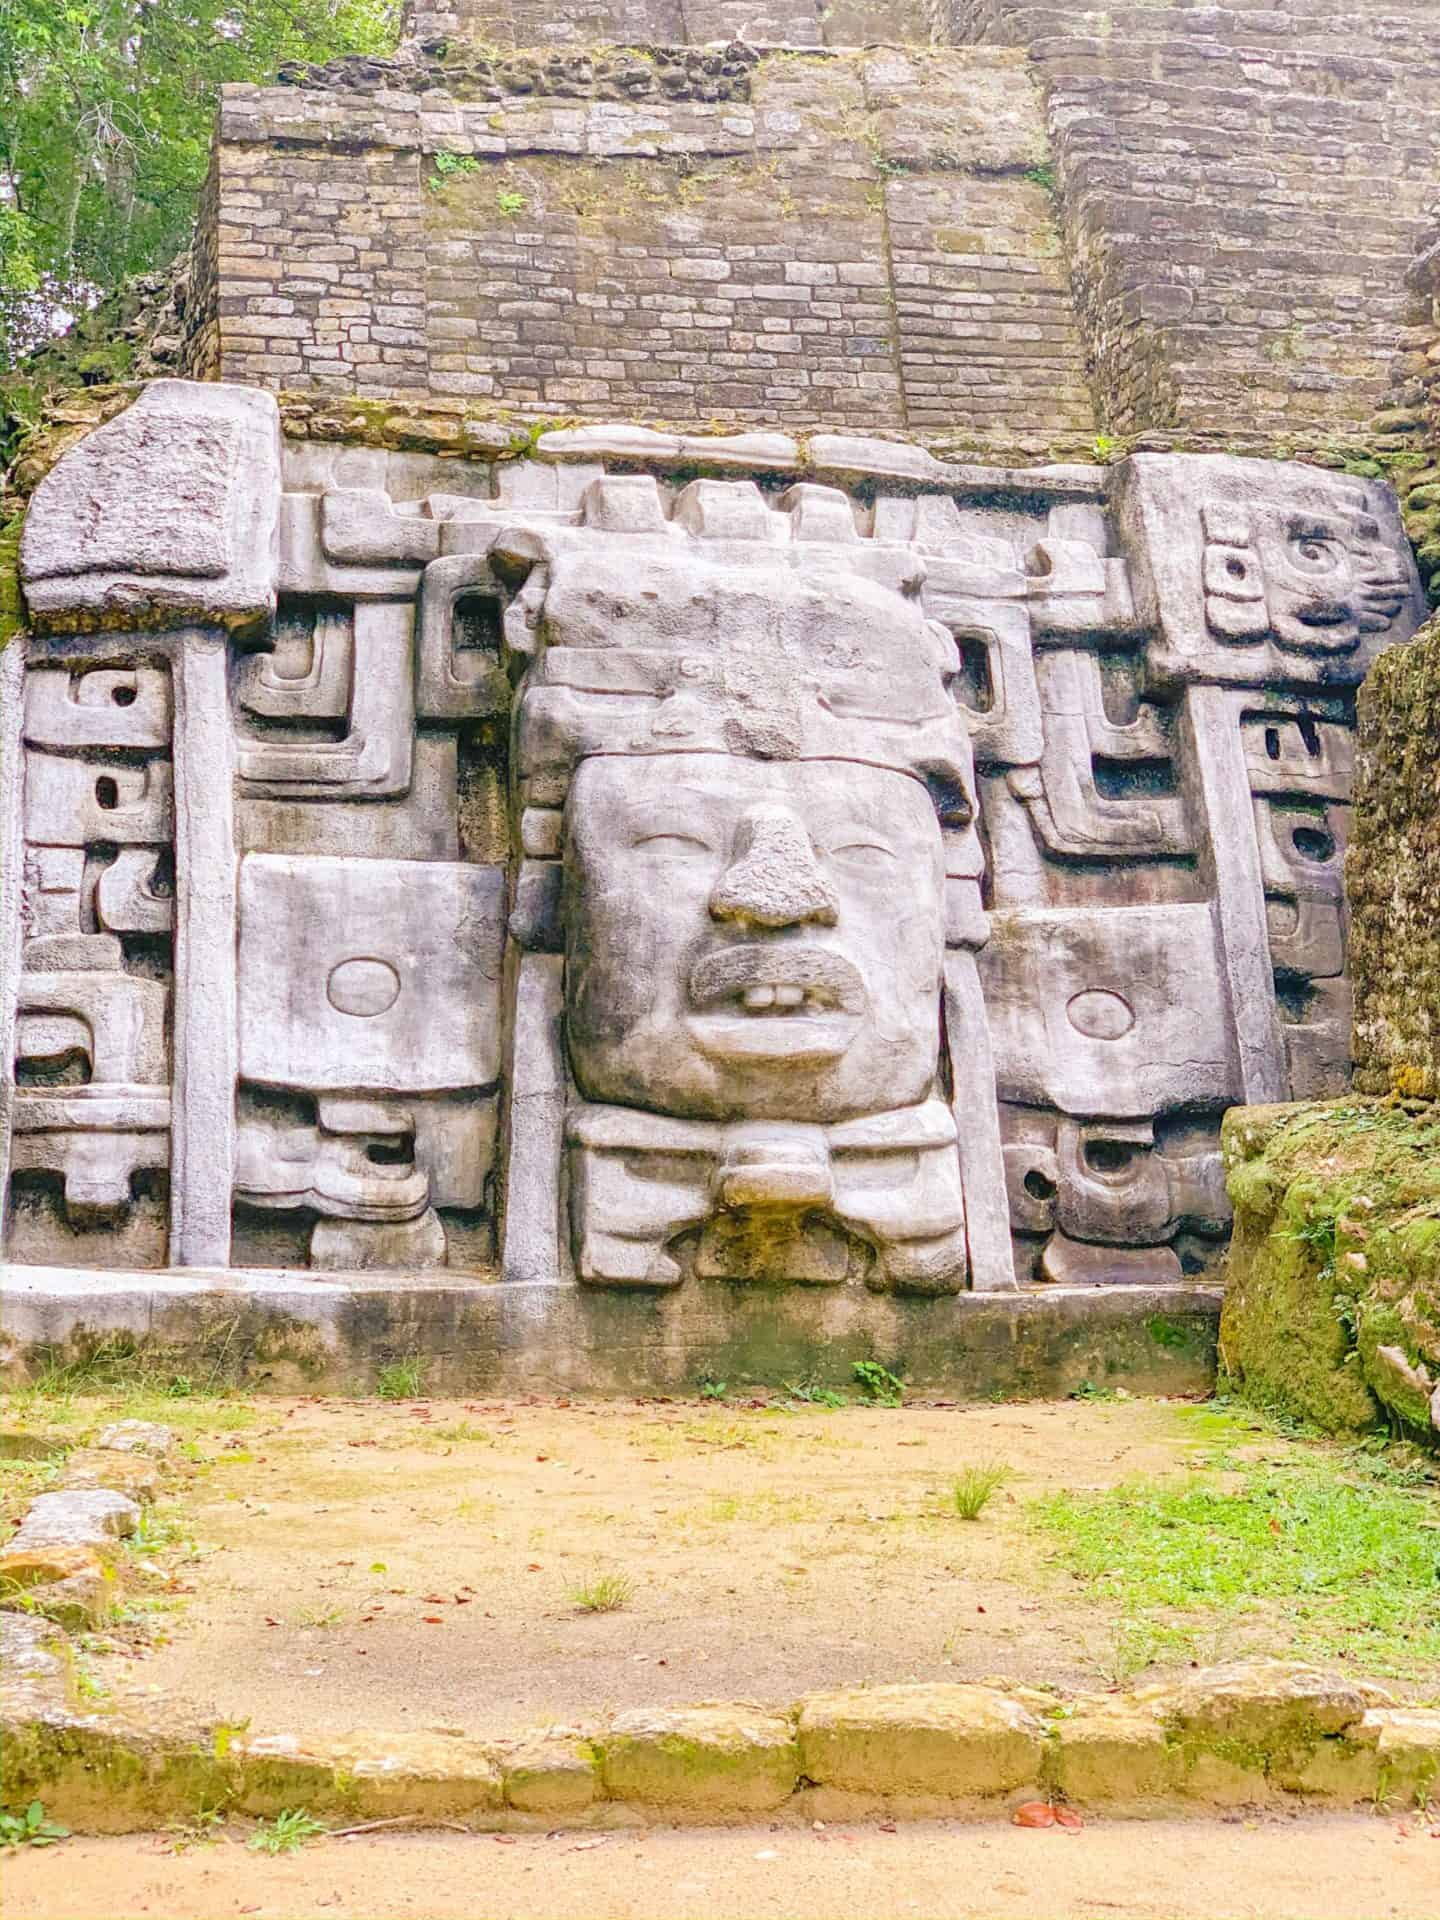 Mayan Temple face - Lamanai, Belize | Shaunda Necole